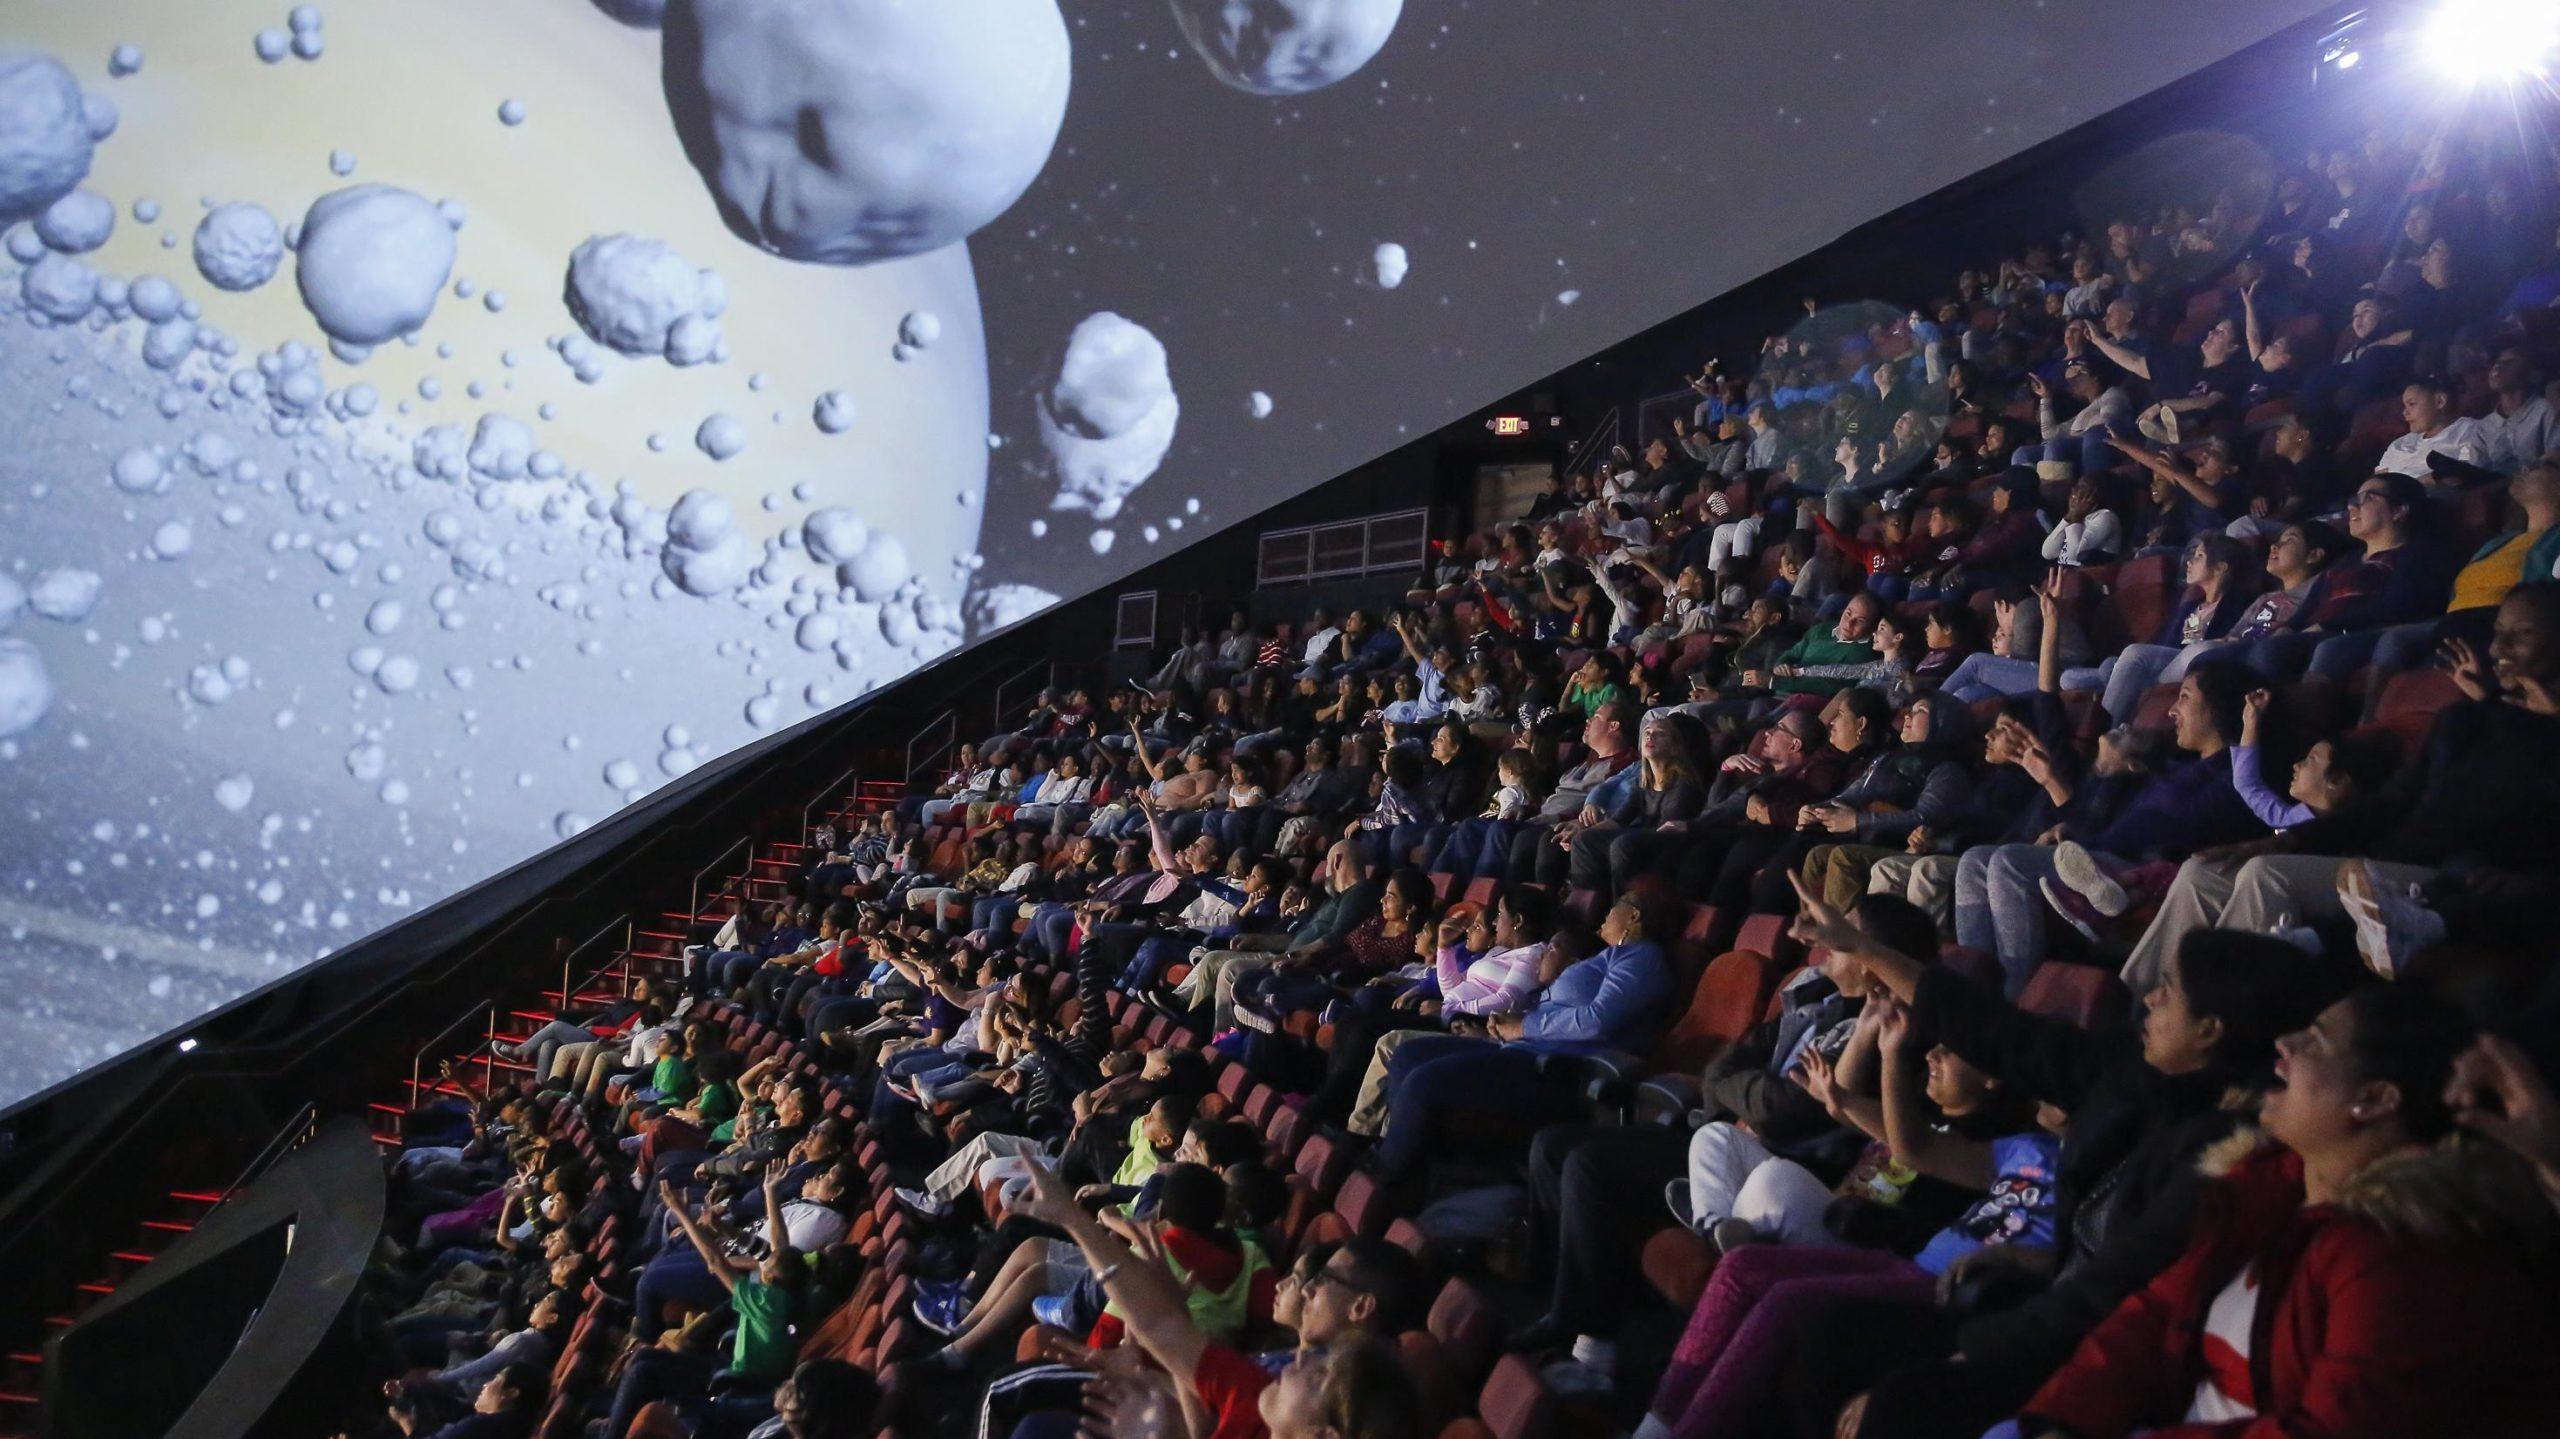 img news fulldome stem-educator-planetarium-position-open-at-liberty-science-center